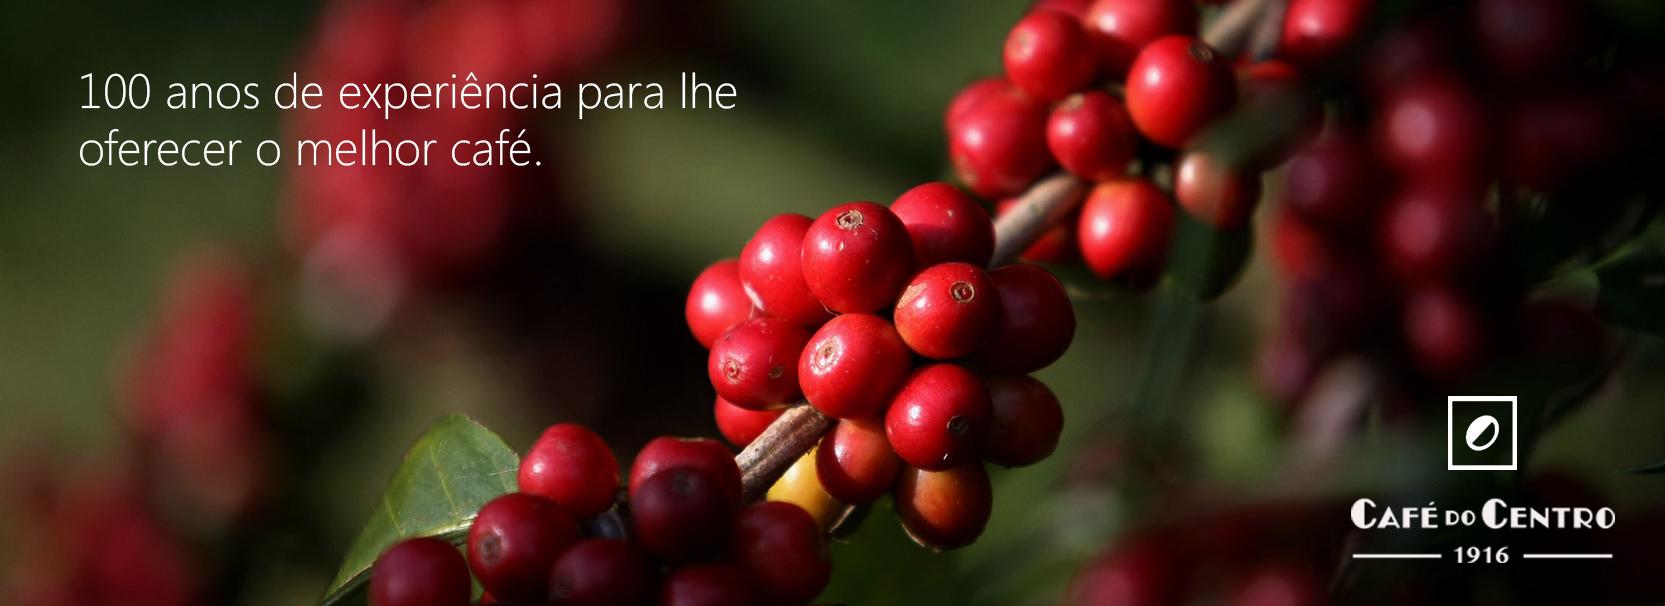 Marca_Cafe_do_Centro